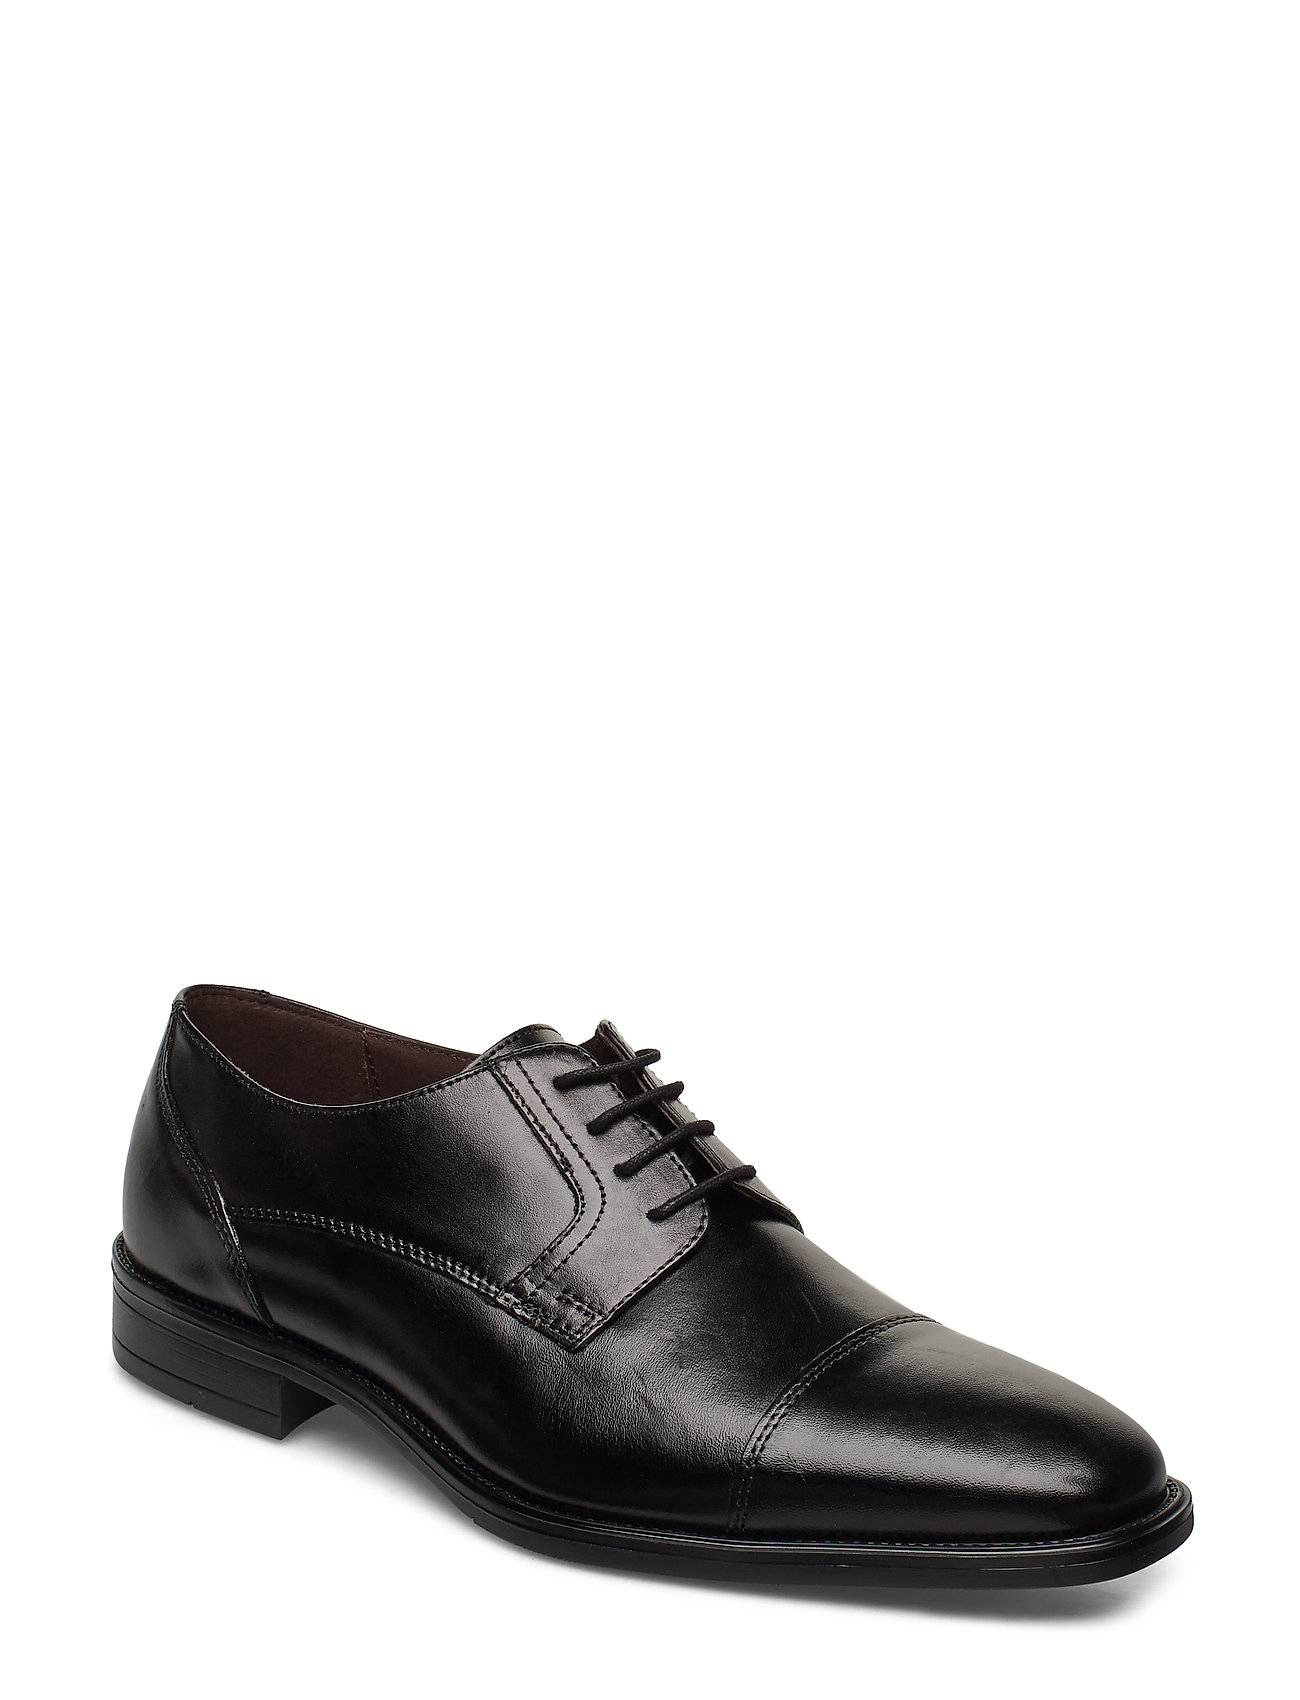 Playboy Footwear 6519 Shoes Business Laced Shoes Musta Playboy Footwear